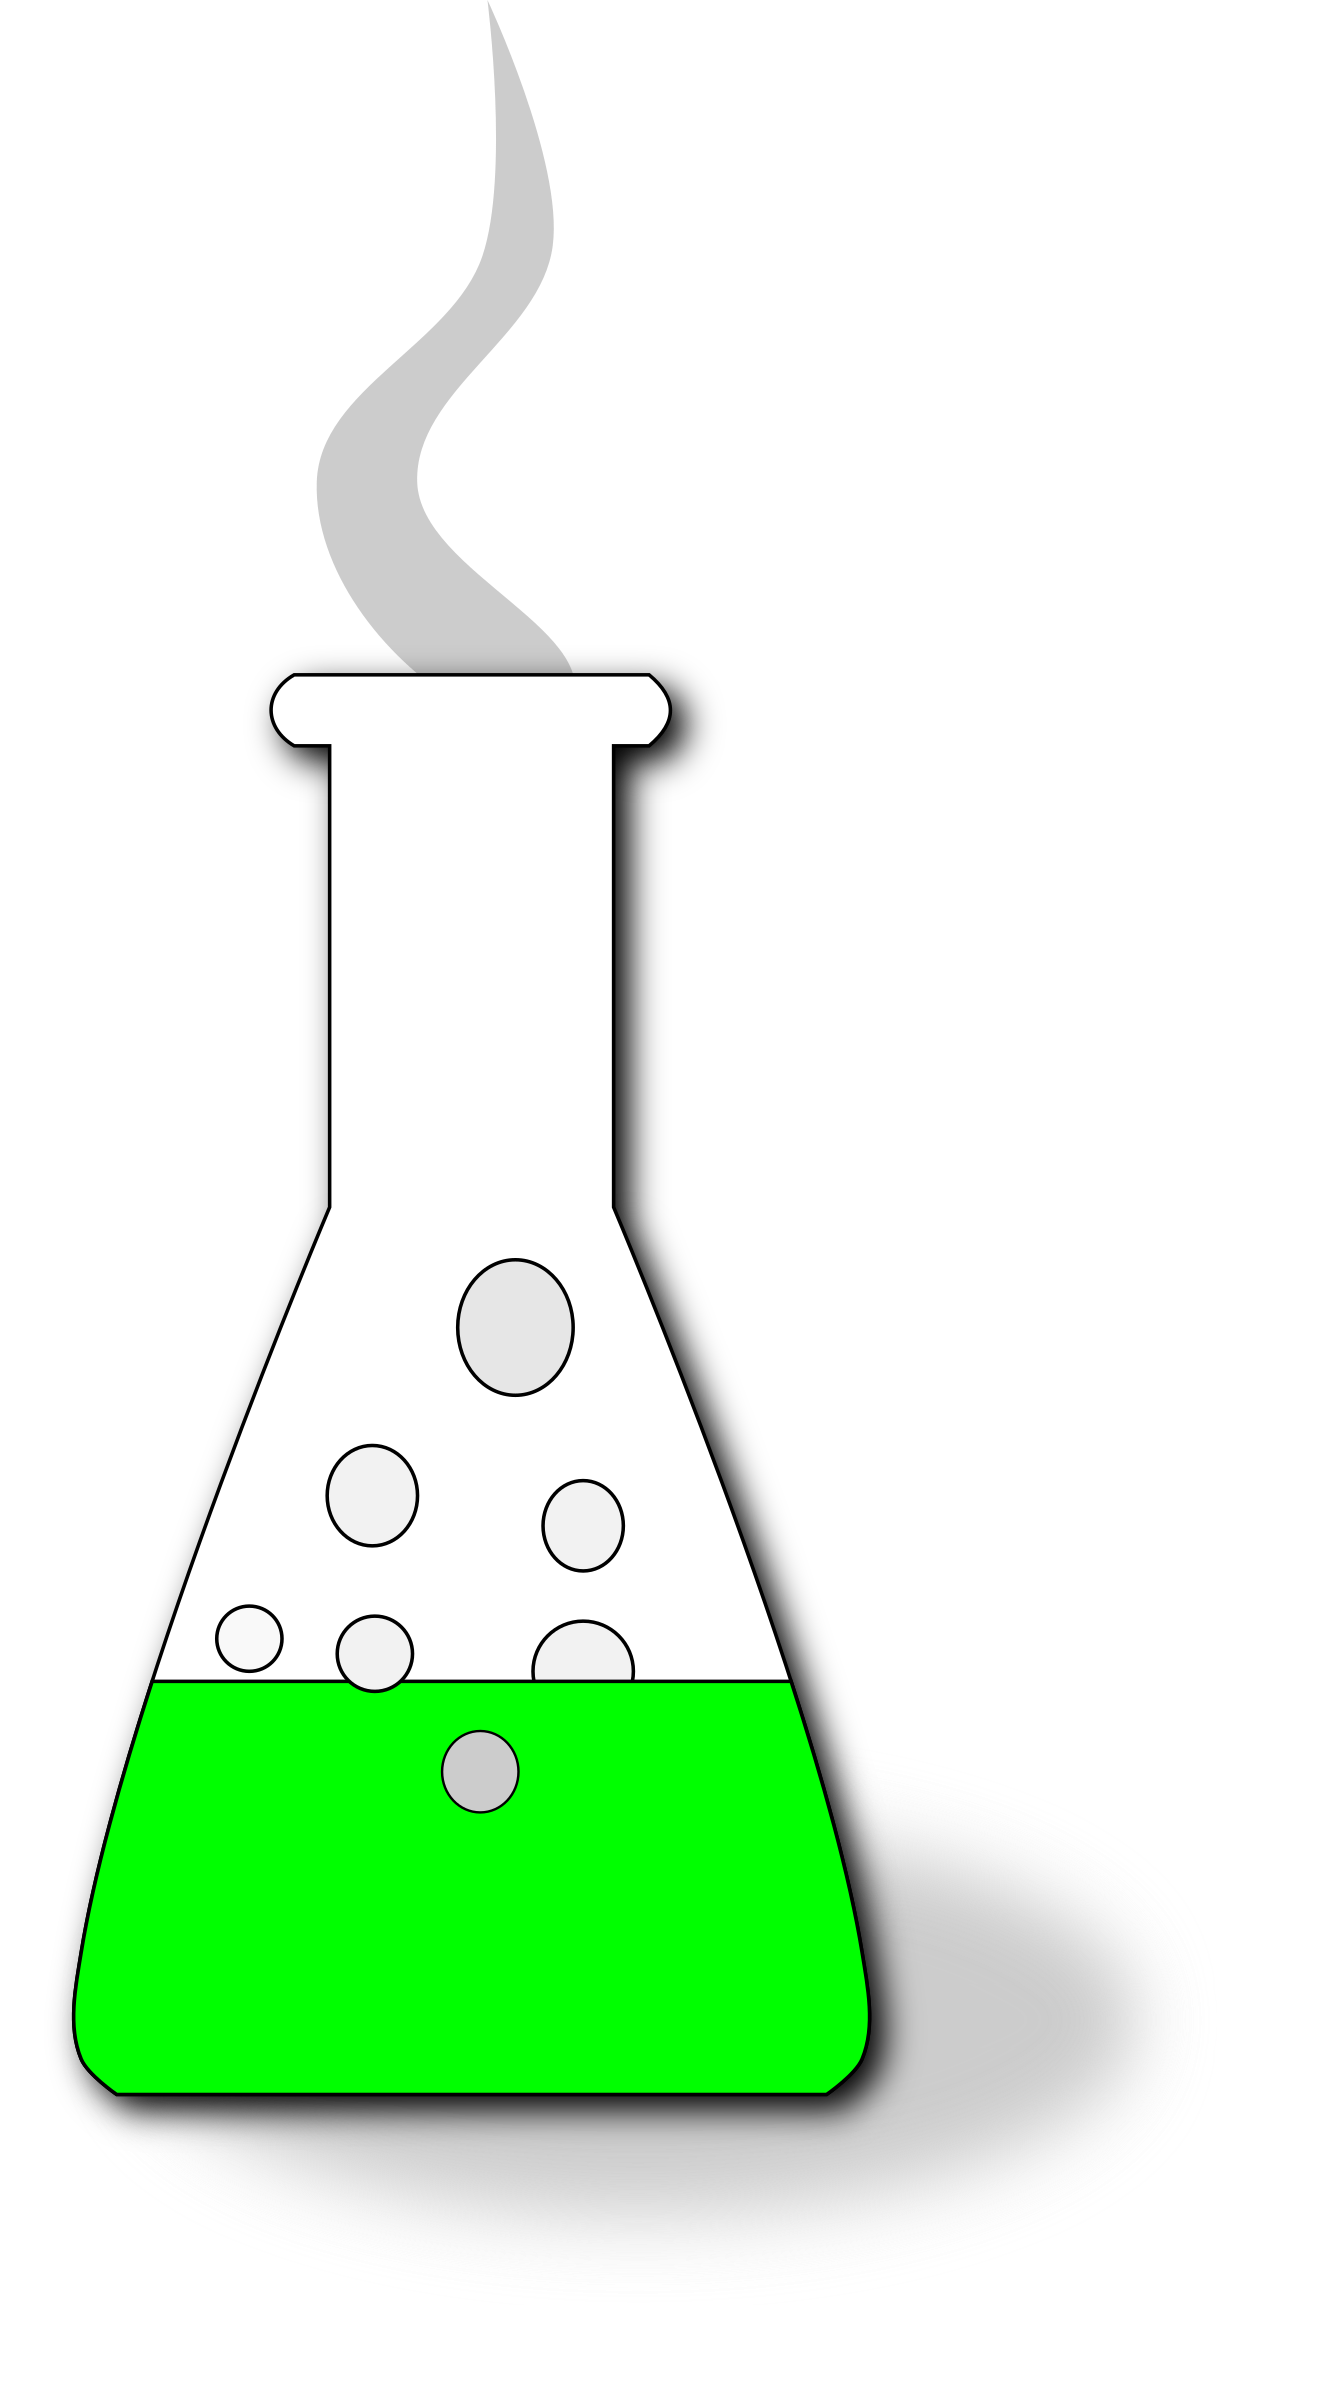 Green clipart beaker. Potion big image png